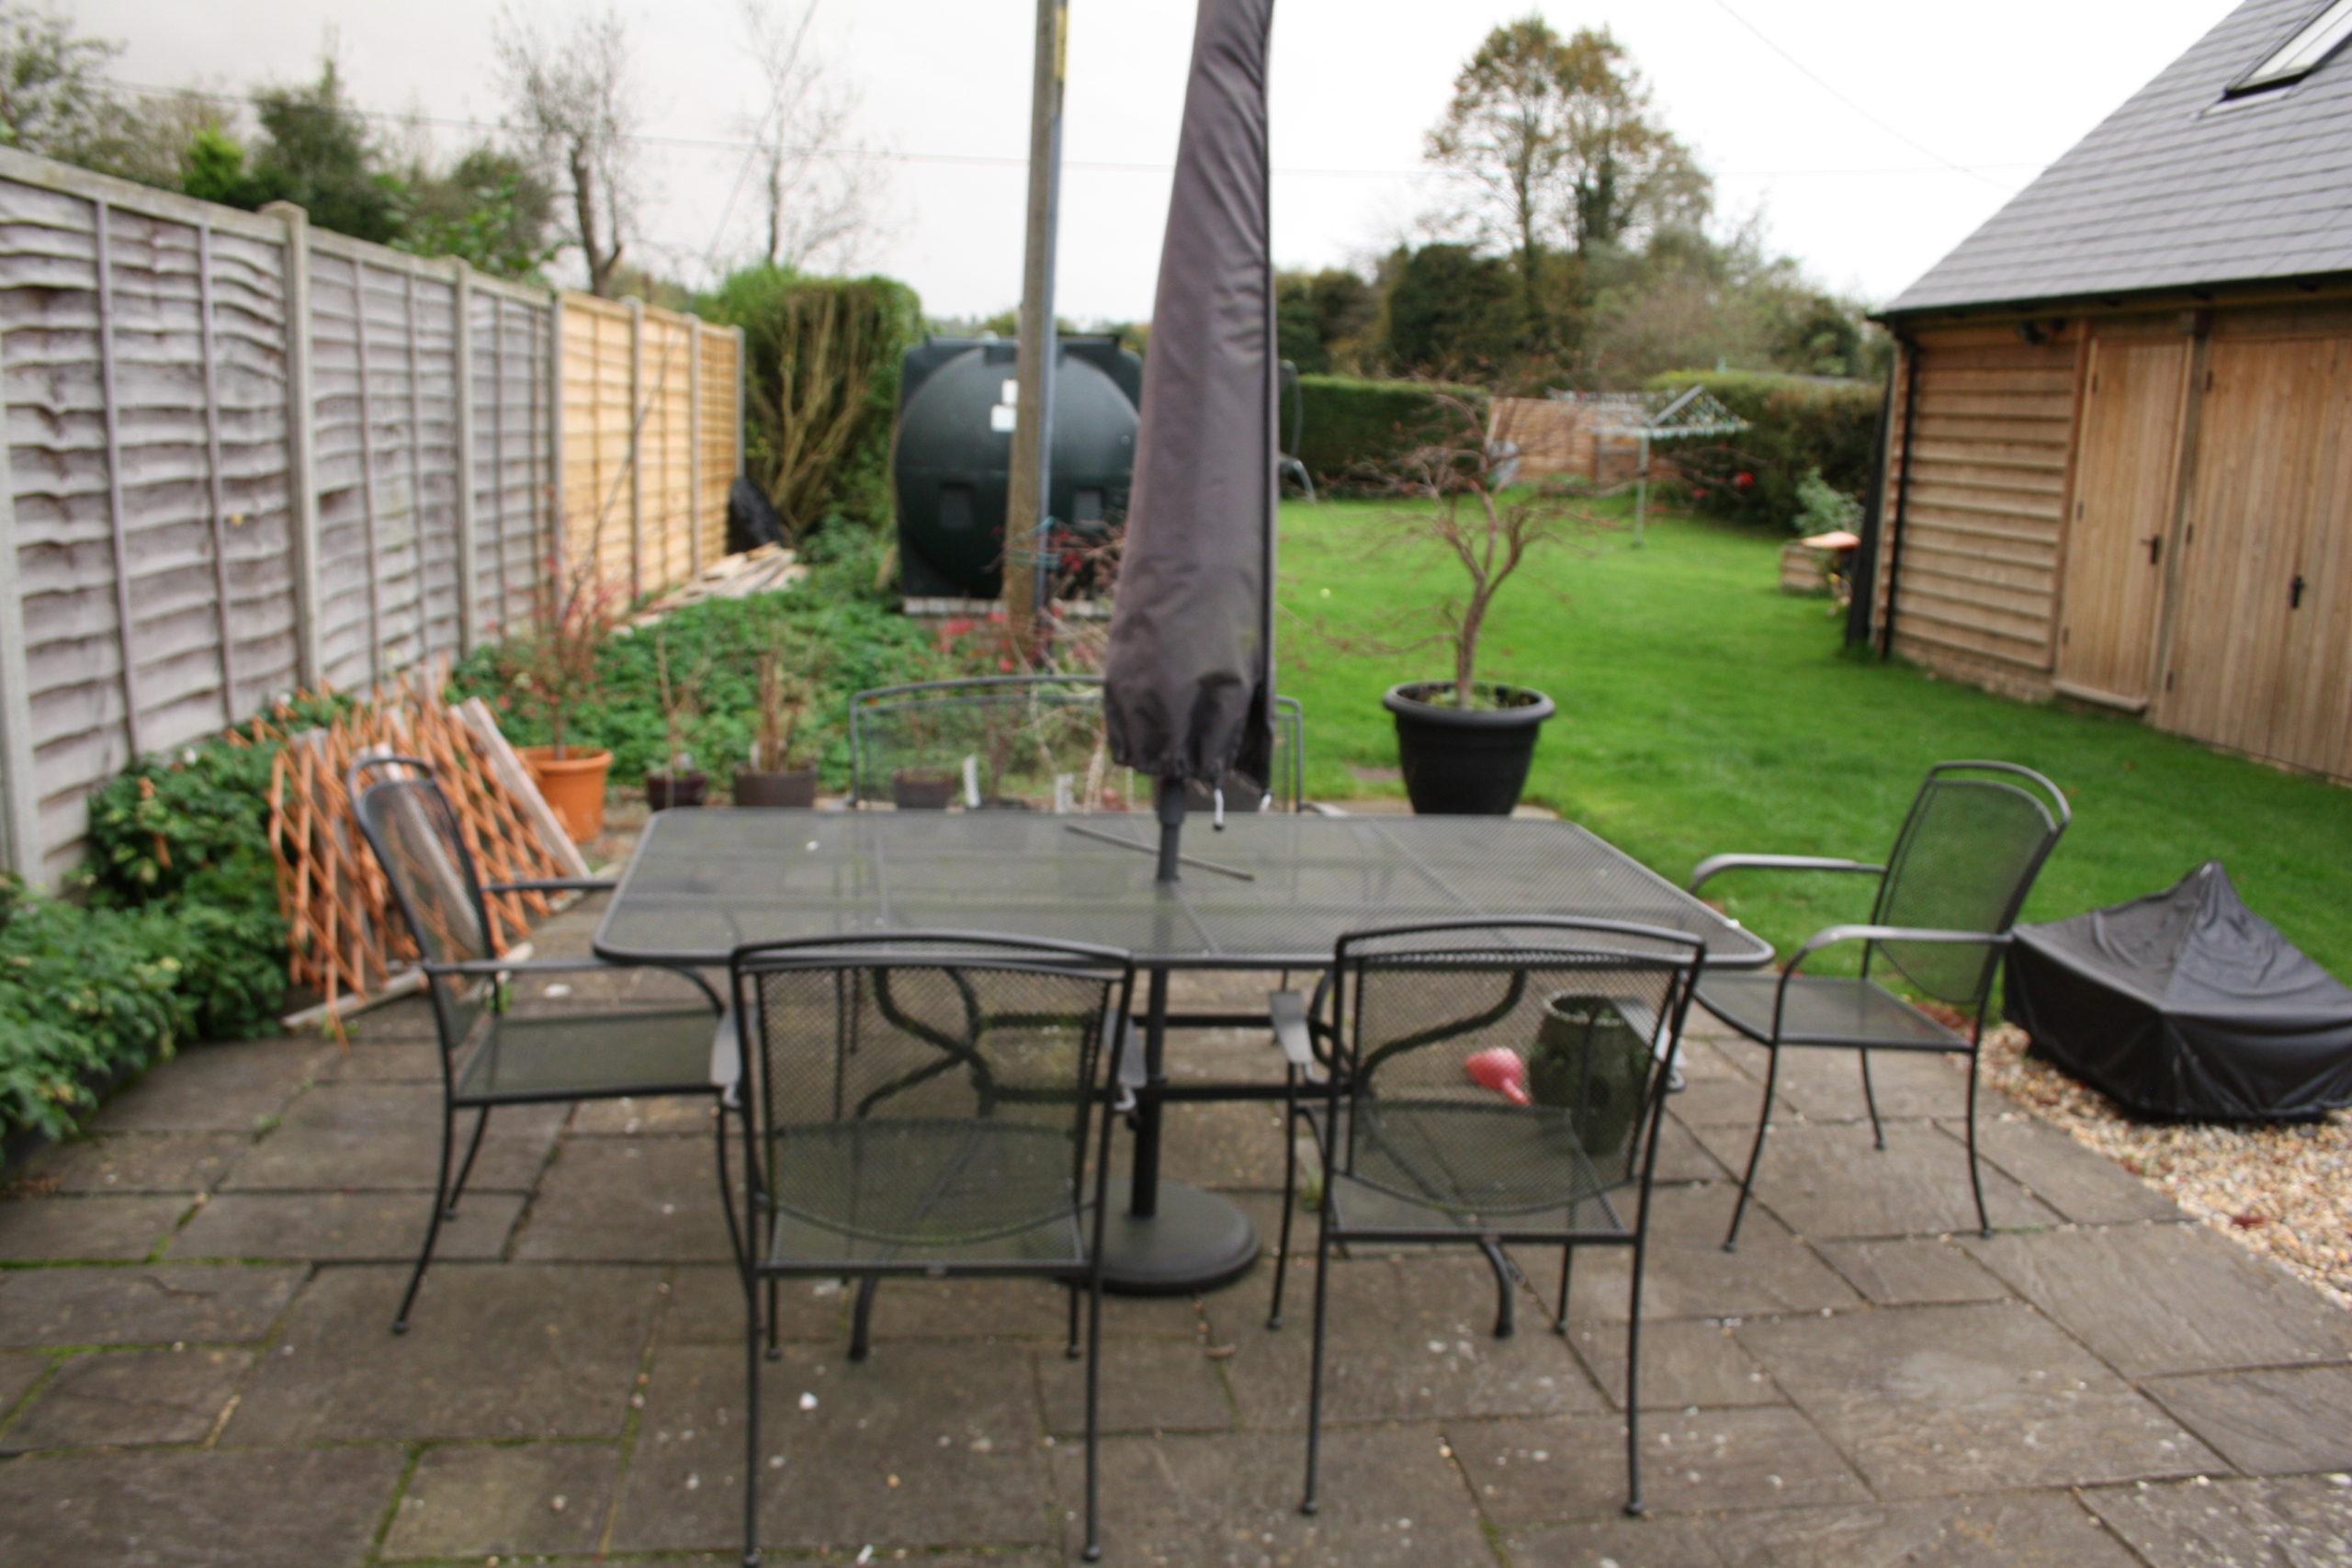 Family Garden - seating before